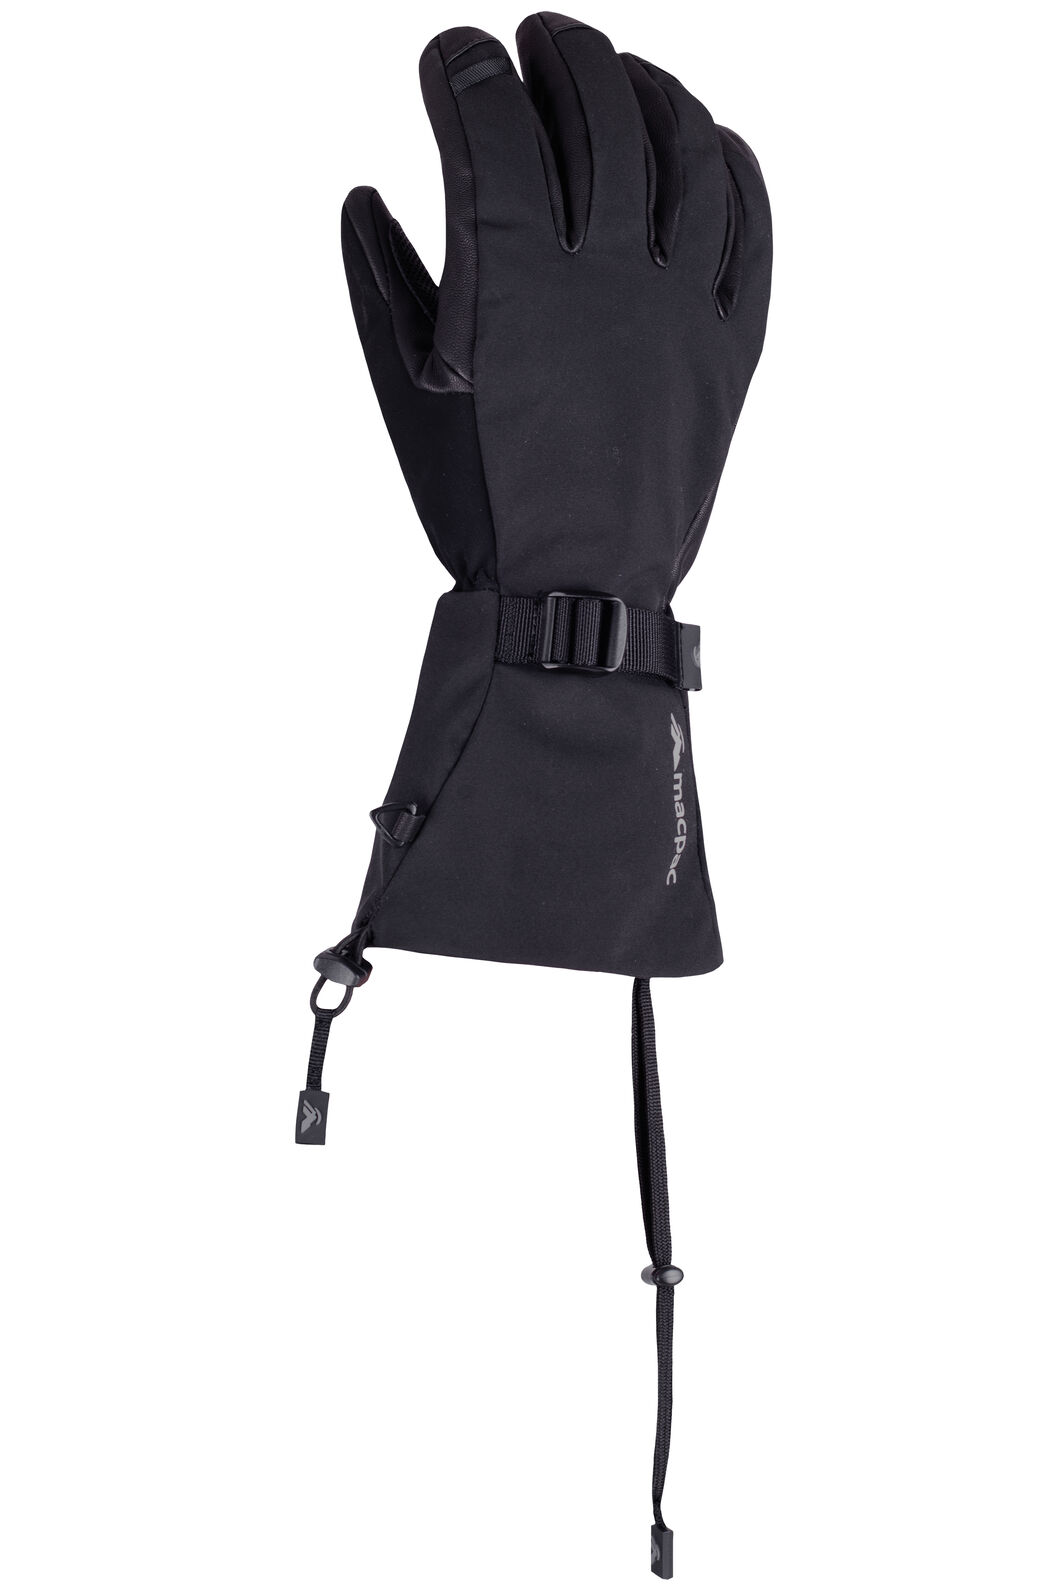 Macpac Powder eVent® Glove, Black, hi-res